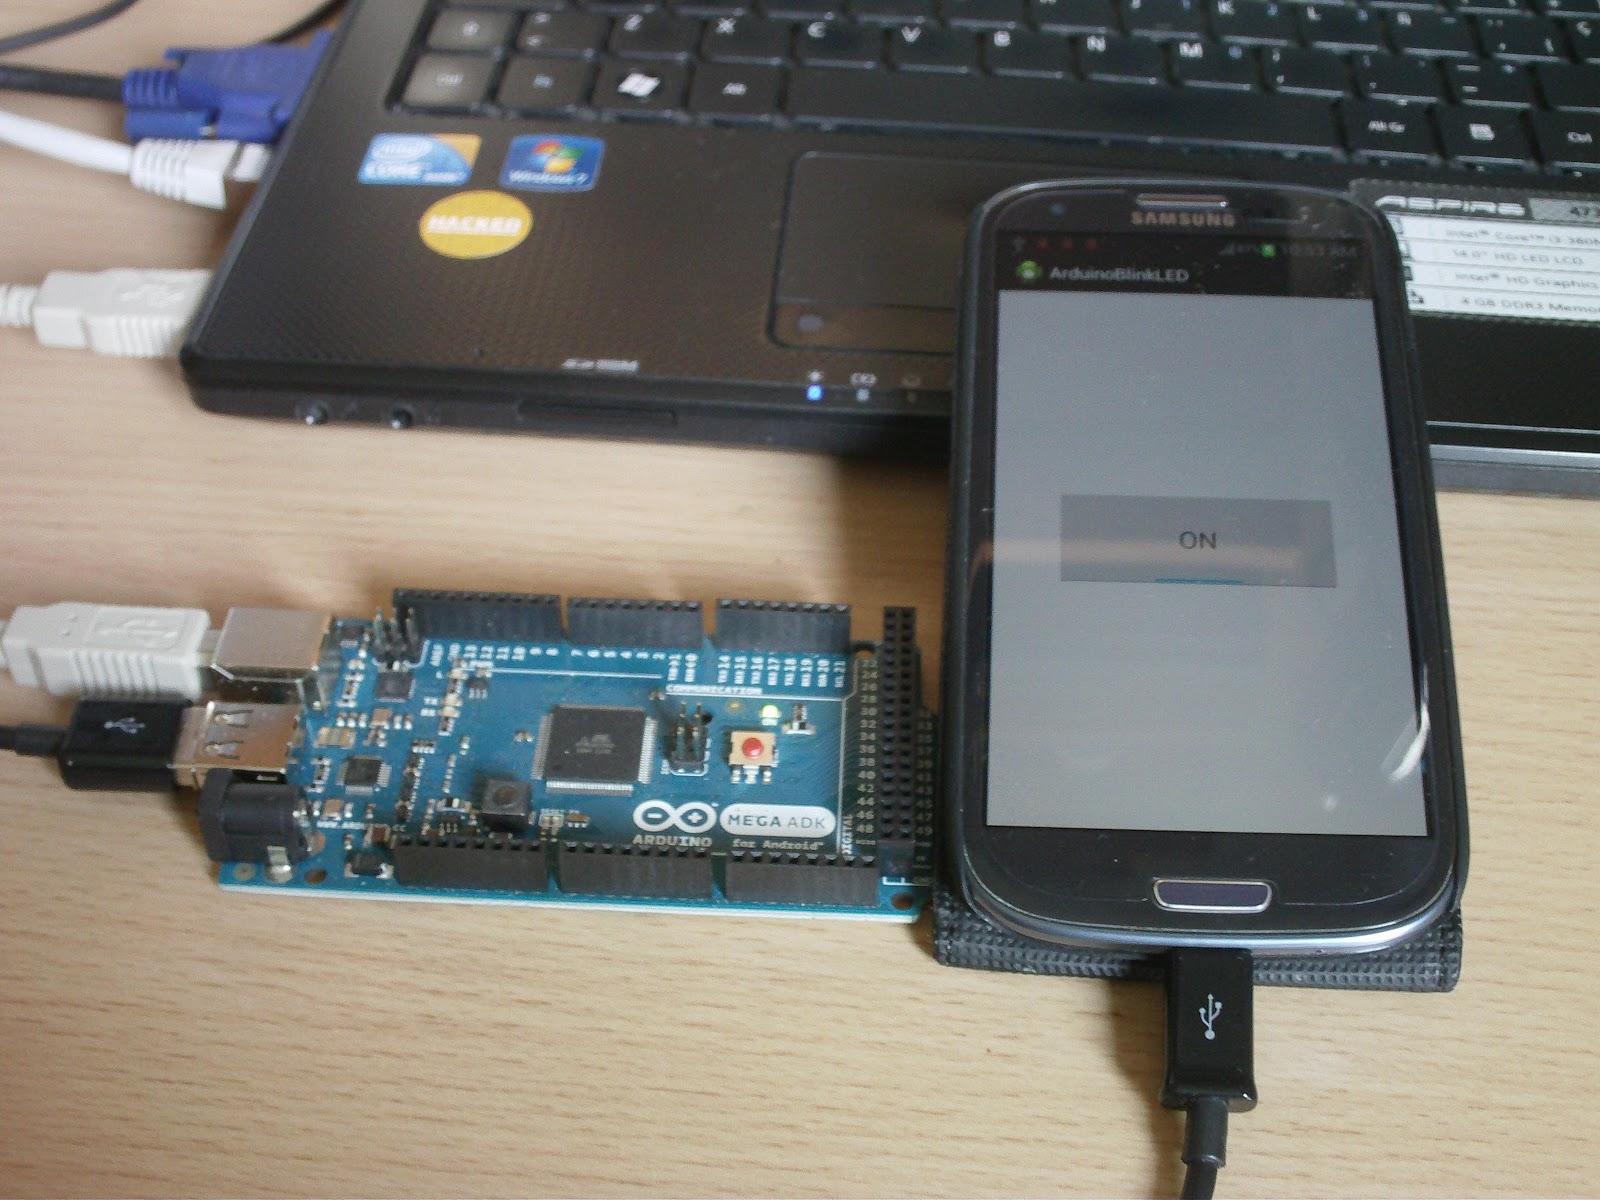 Progra mecatronica y mas arduino mega adk android